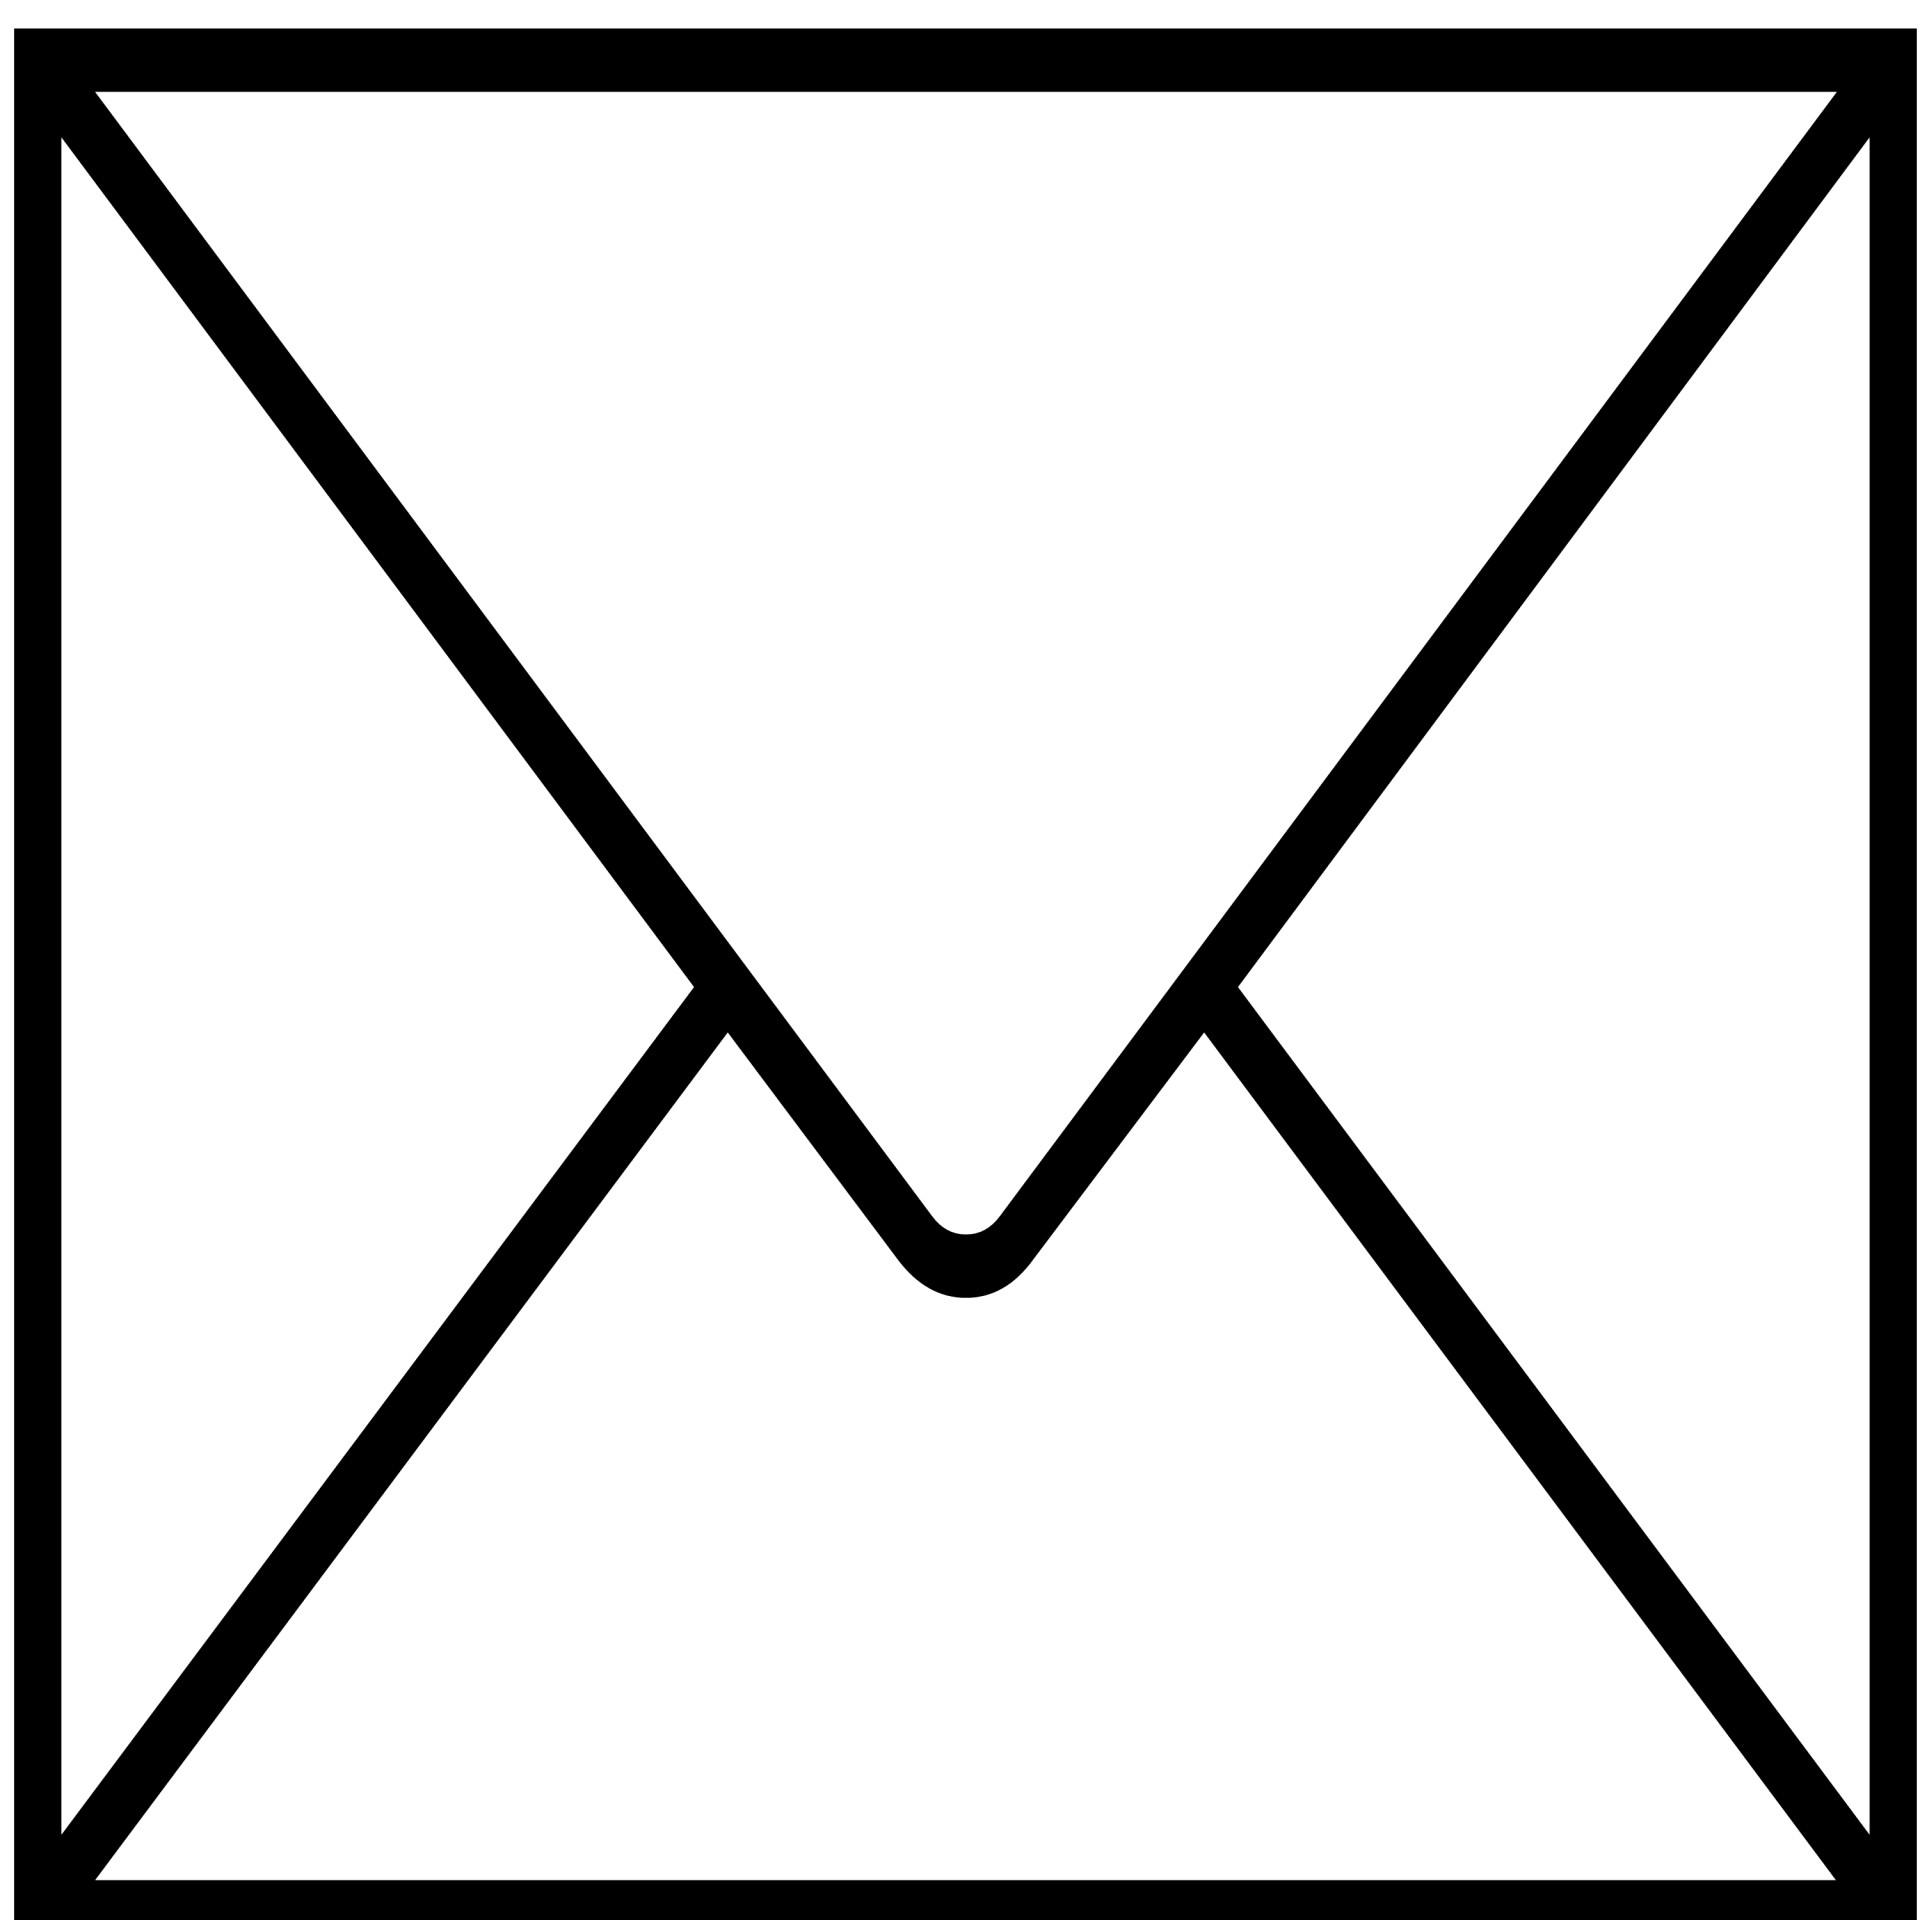 Envelope Silhouette Free Stock Photo Public Domain Pictures